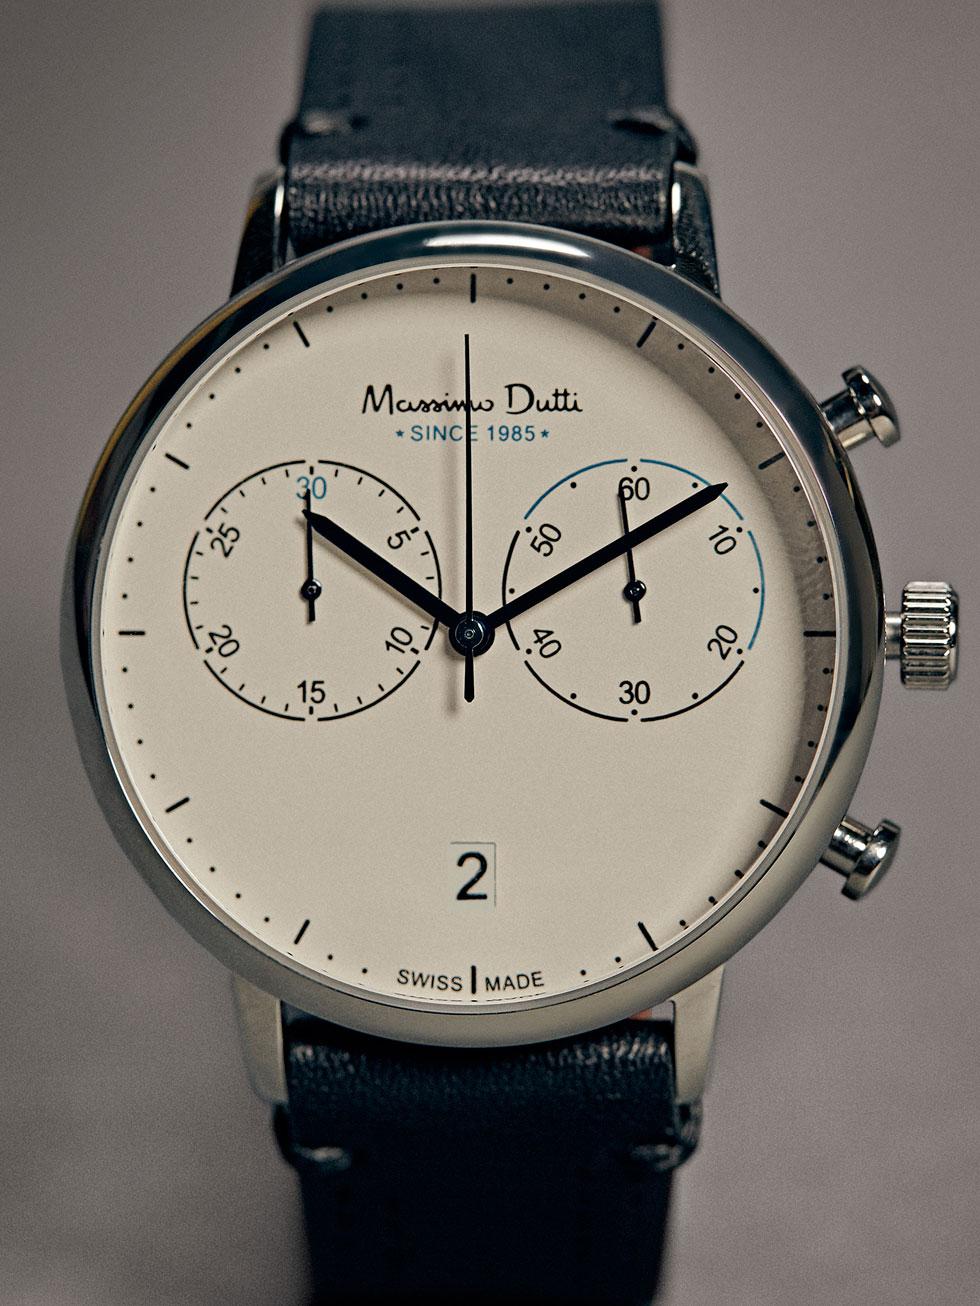 Lo ultimo en relojes masculinos de Massimo Dutti 8